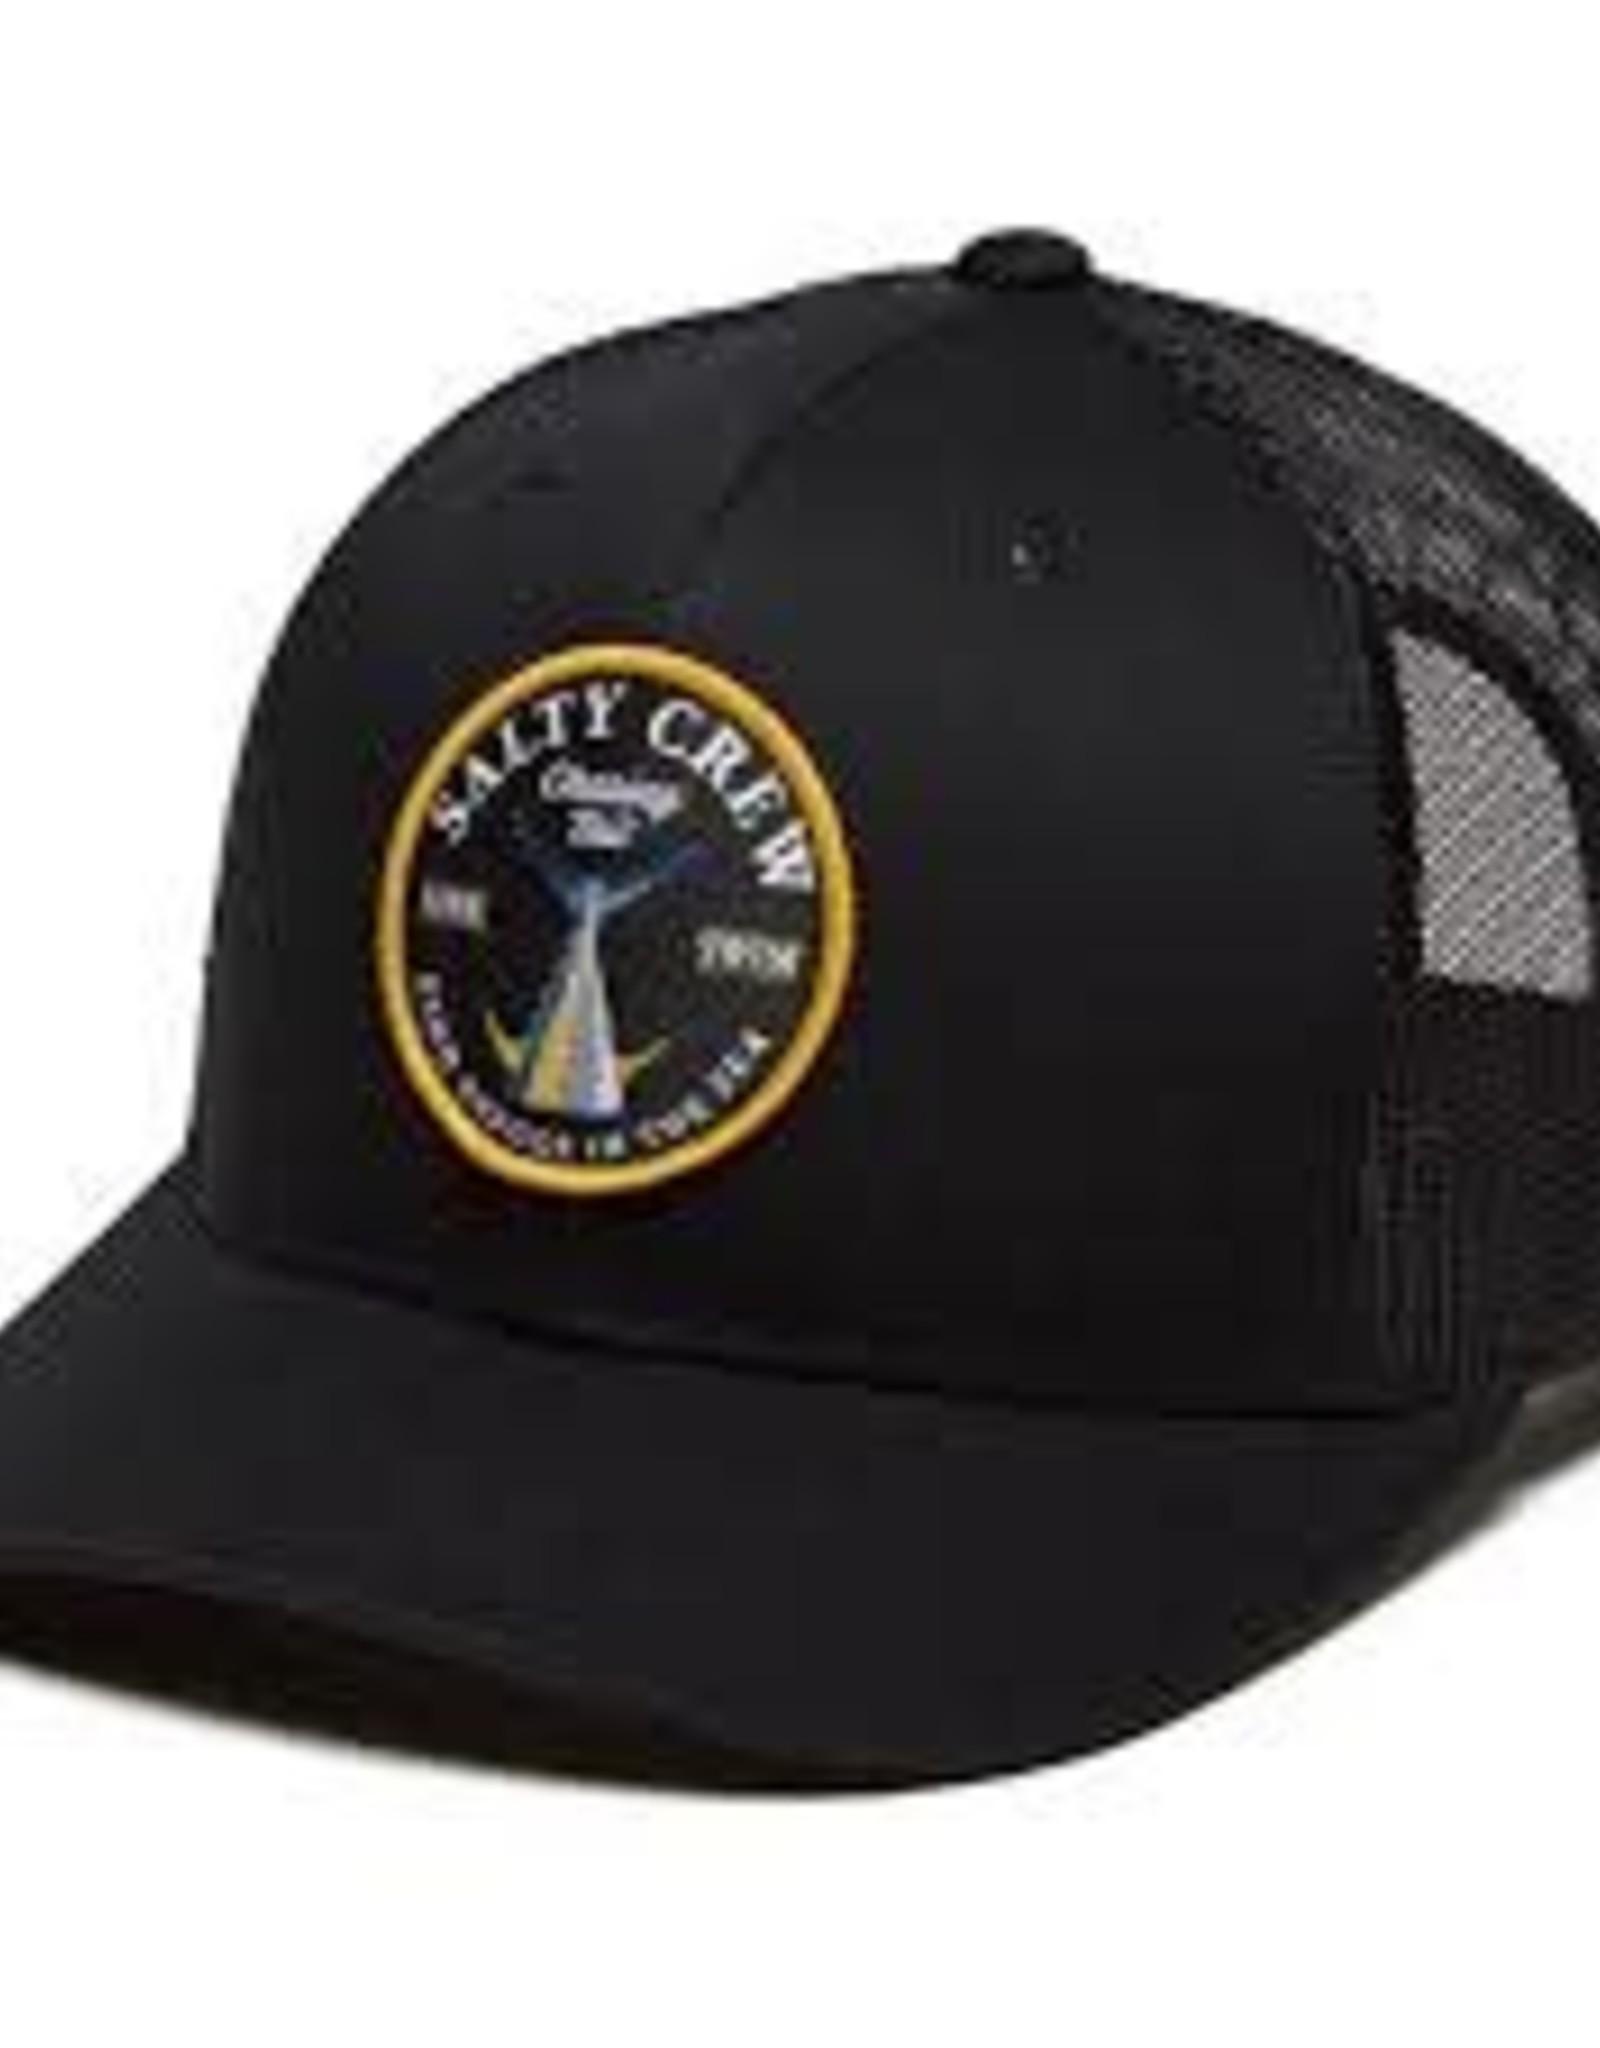 salty crew Salty Crew Bottom Dweller Trucker Hat